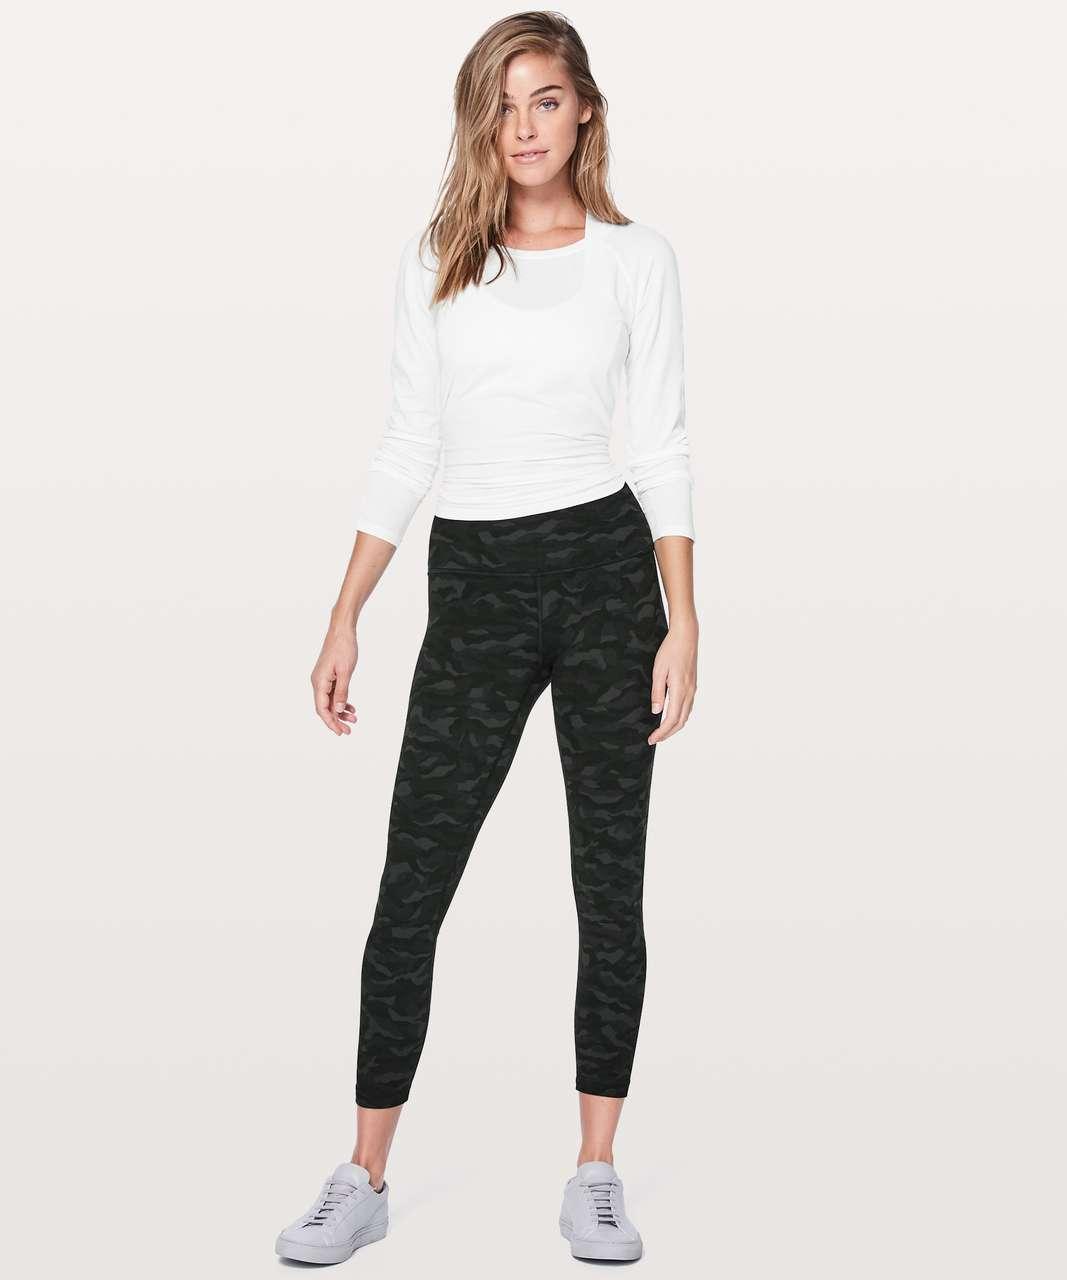 "Lululemon Align Pant II 25"" - Sequoia Camo Print Deep Coal Black"